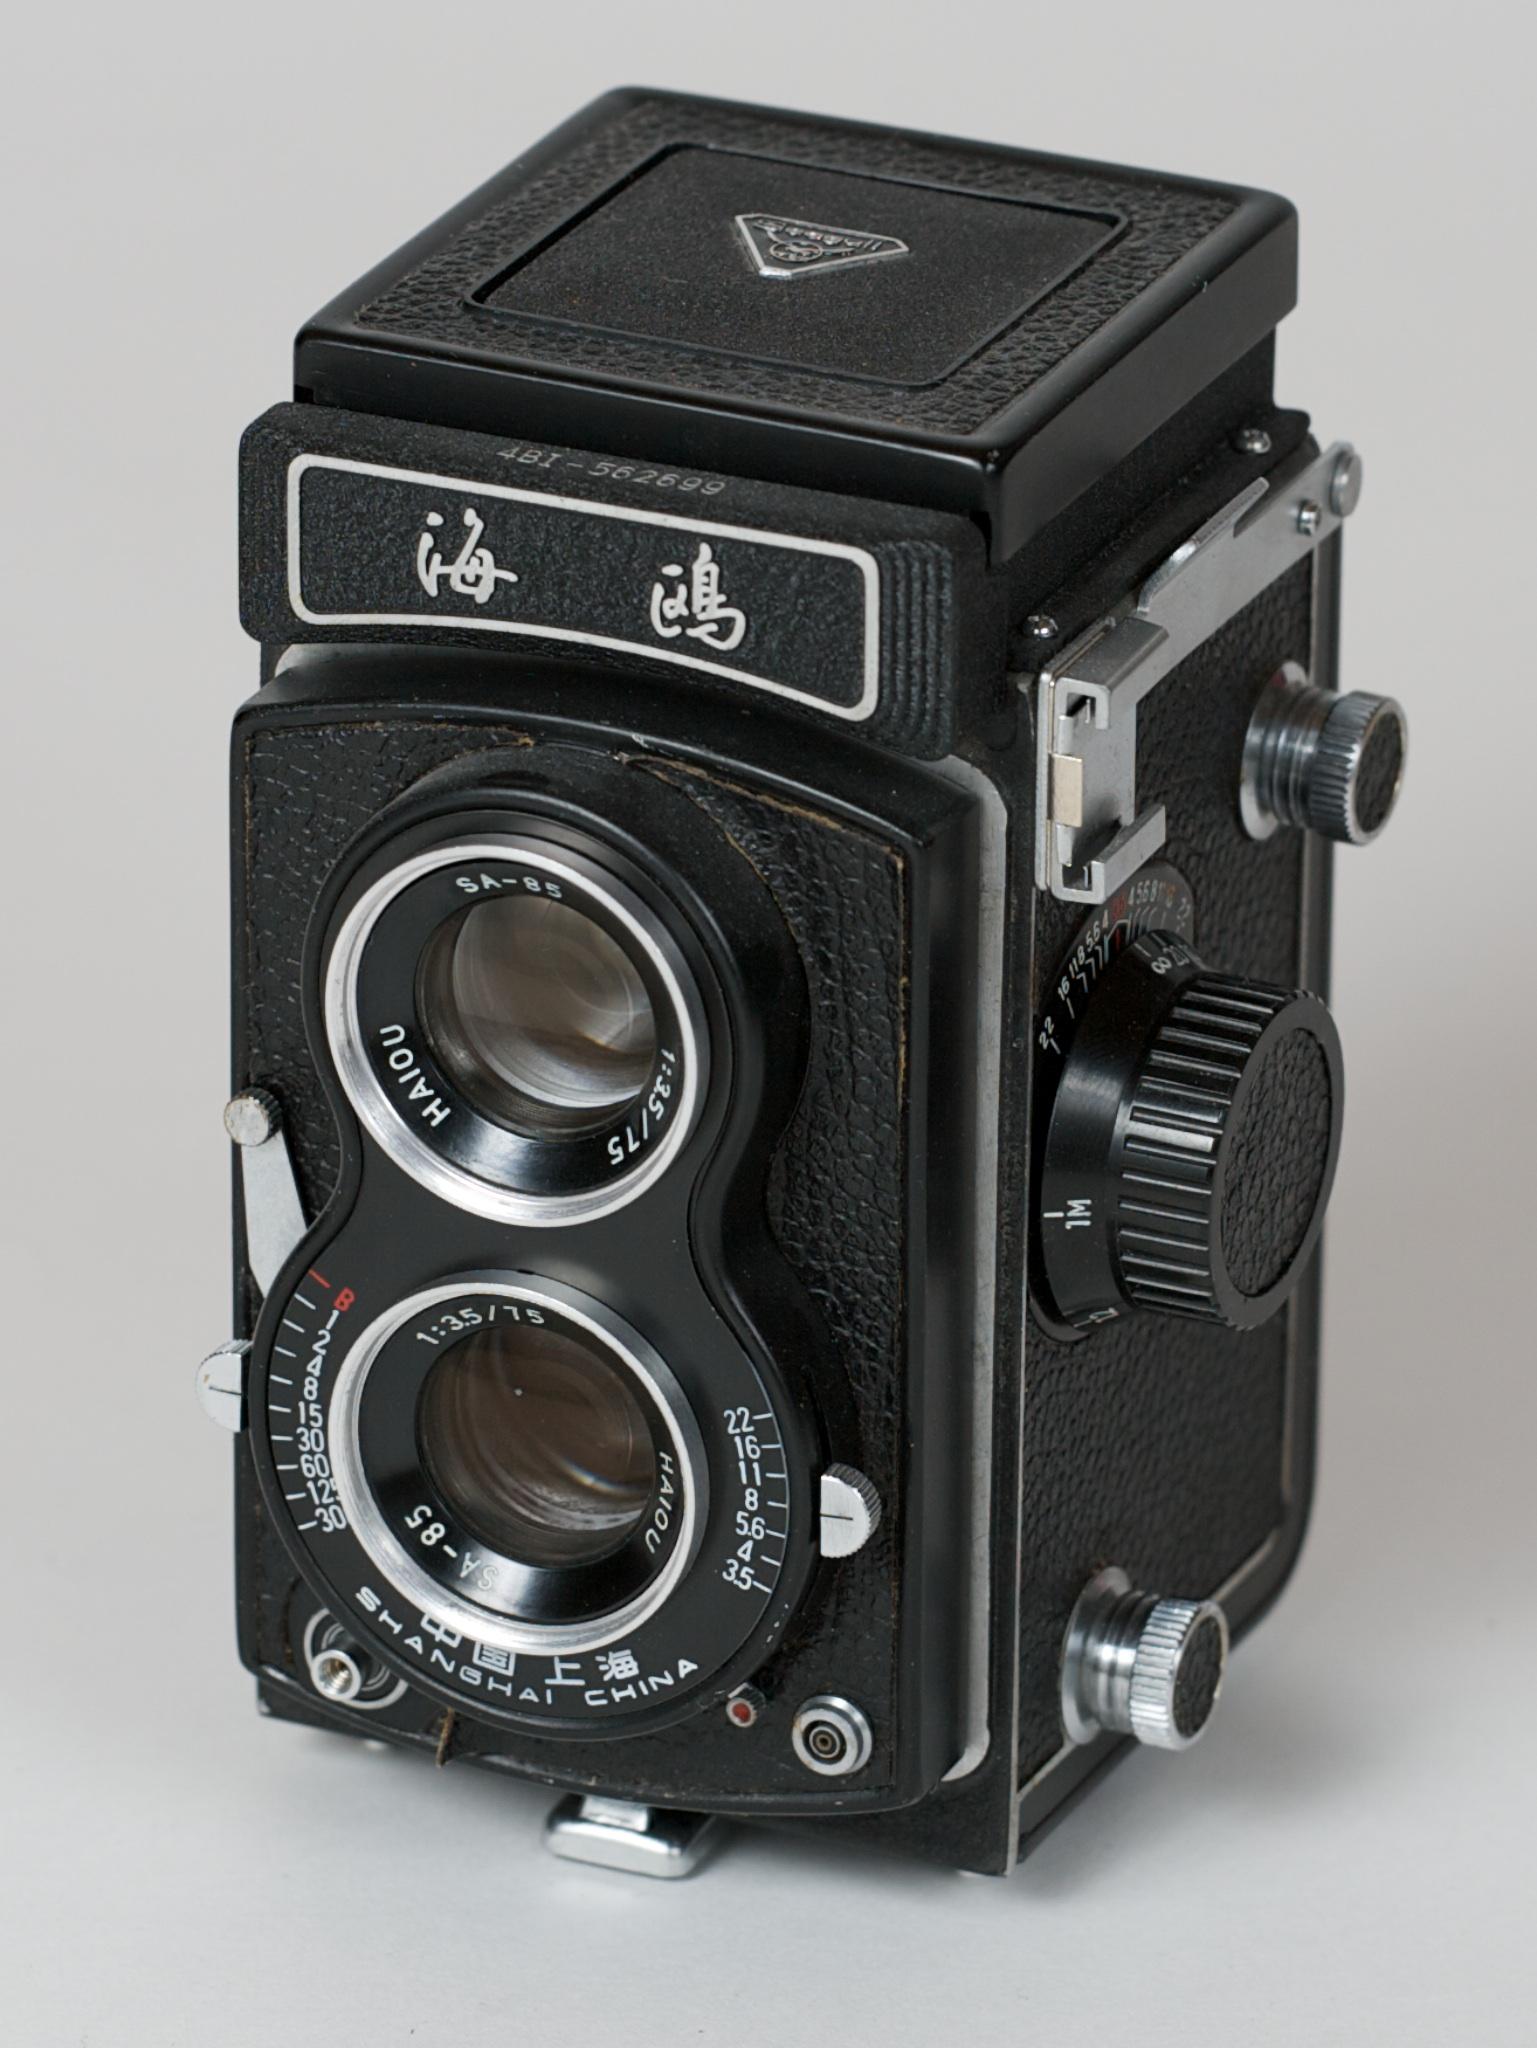 Приклад для цифрового фотоаппарата пятилетнем